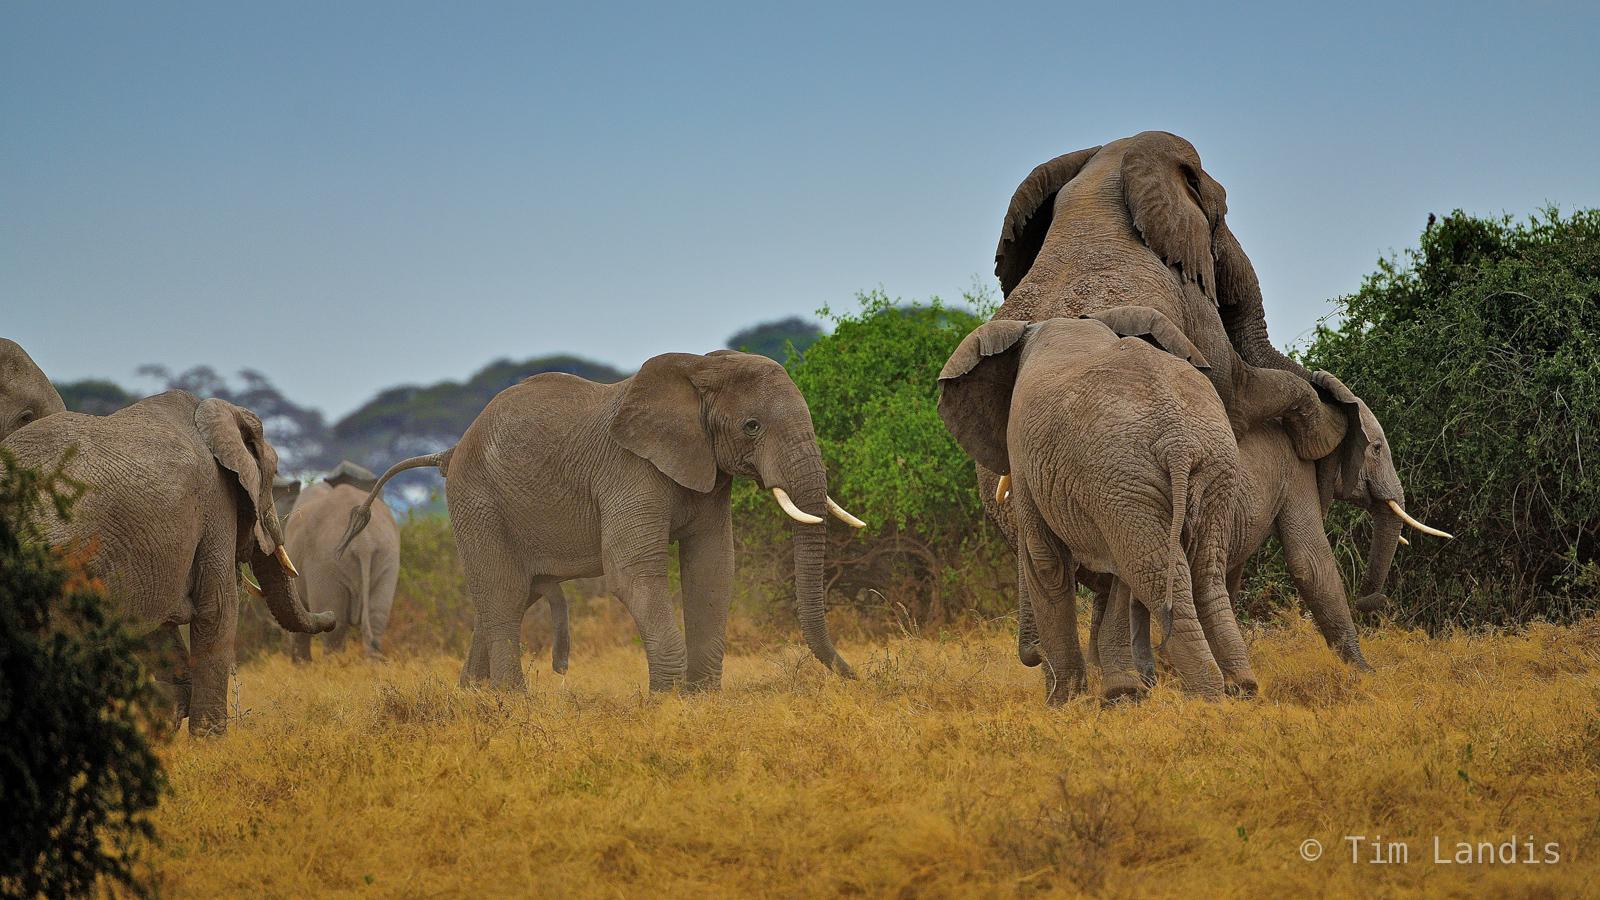 Elephants copulating, elephant love, elephants mating, elephants party, love, photo